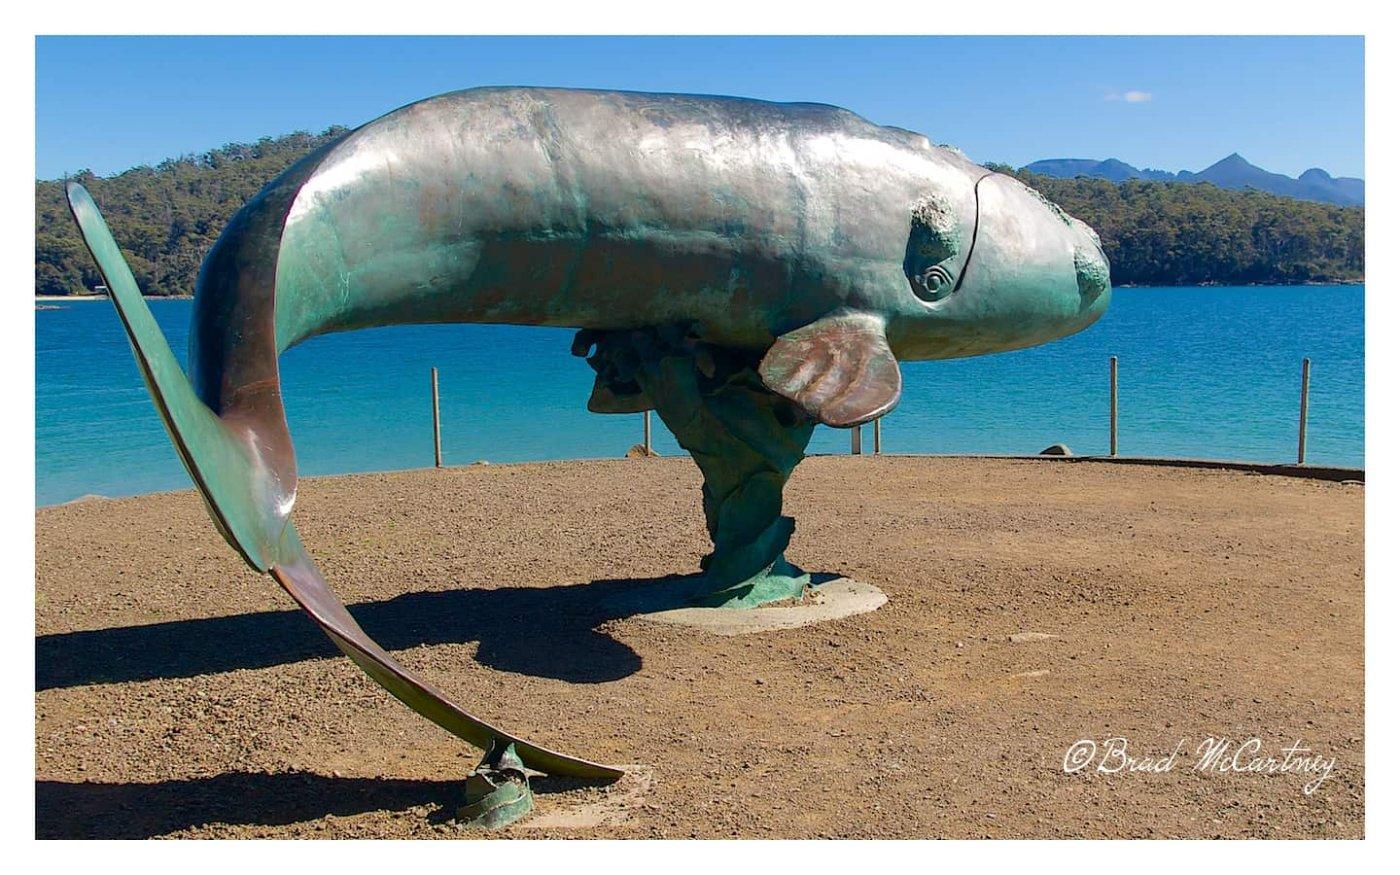 Whale Sculpture near Cockle Creek